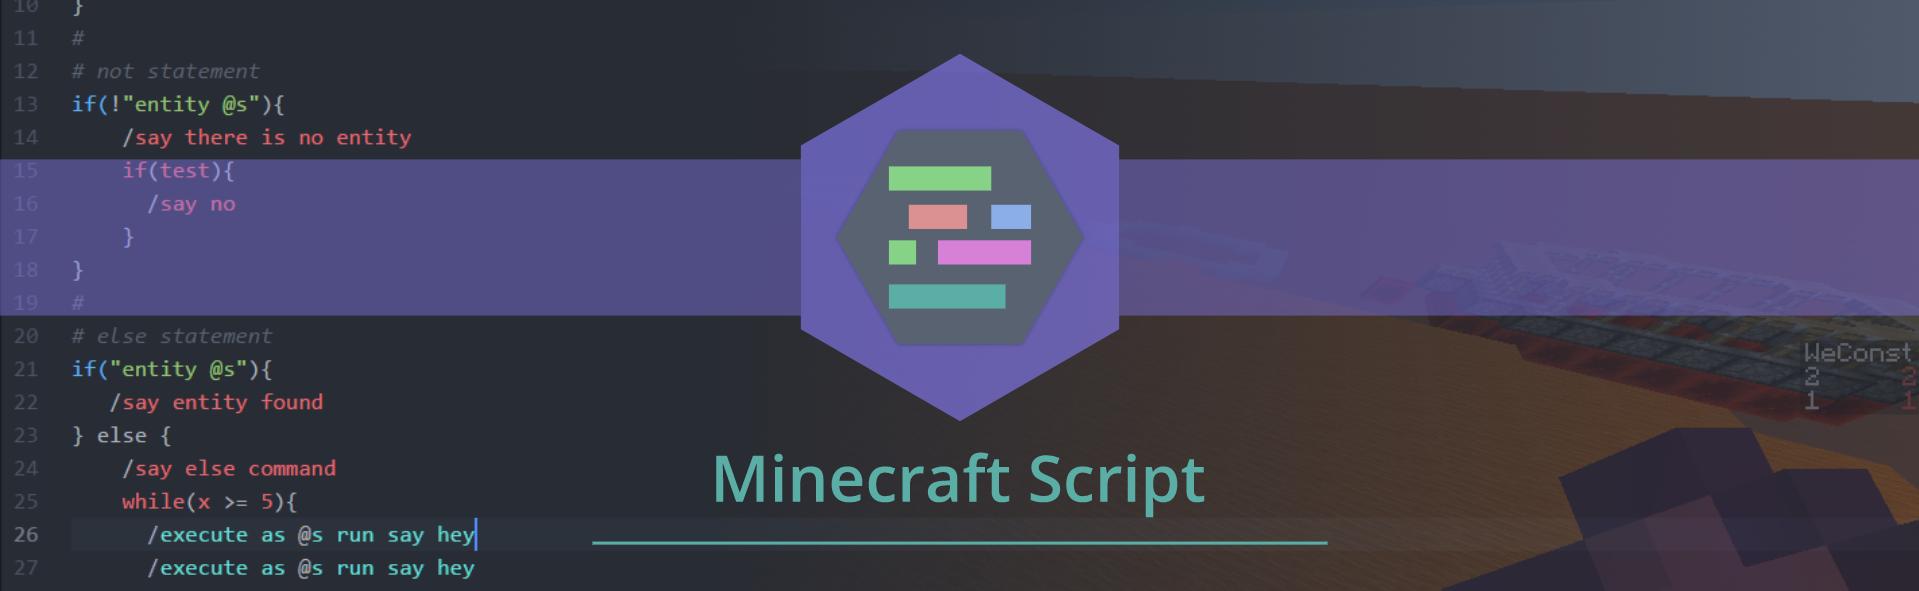 GitHub - Stevertus/mcscript: A programming language for